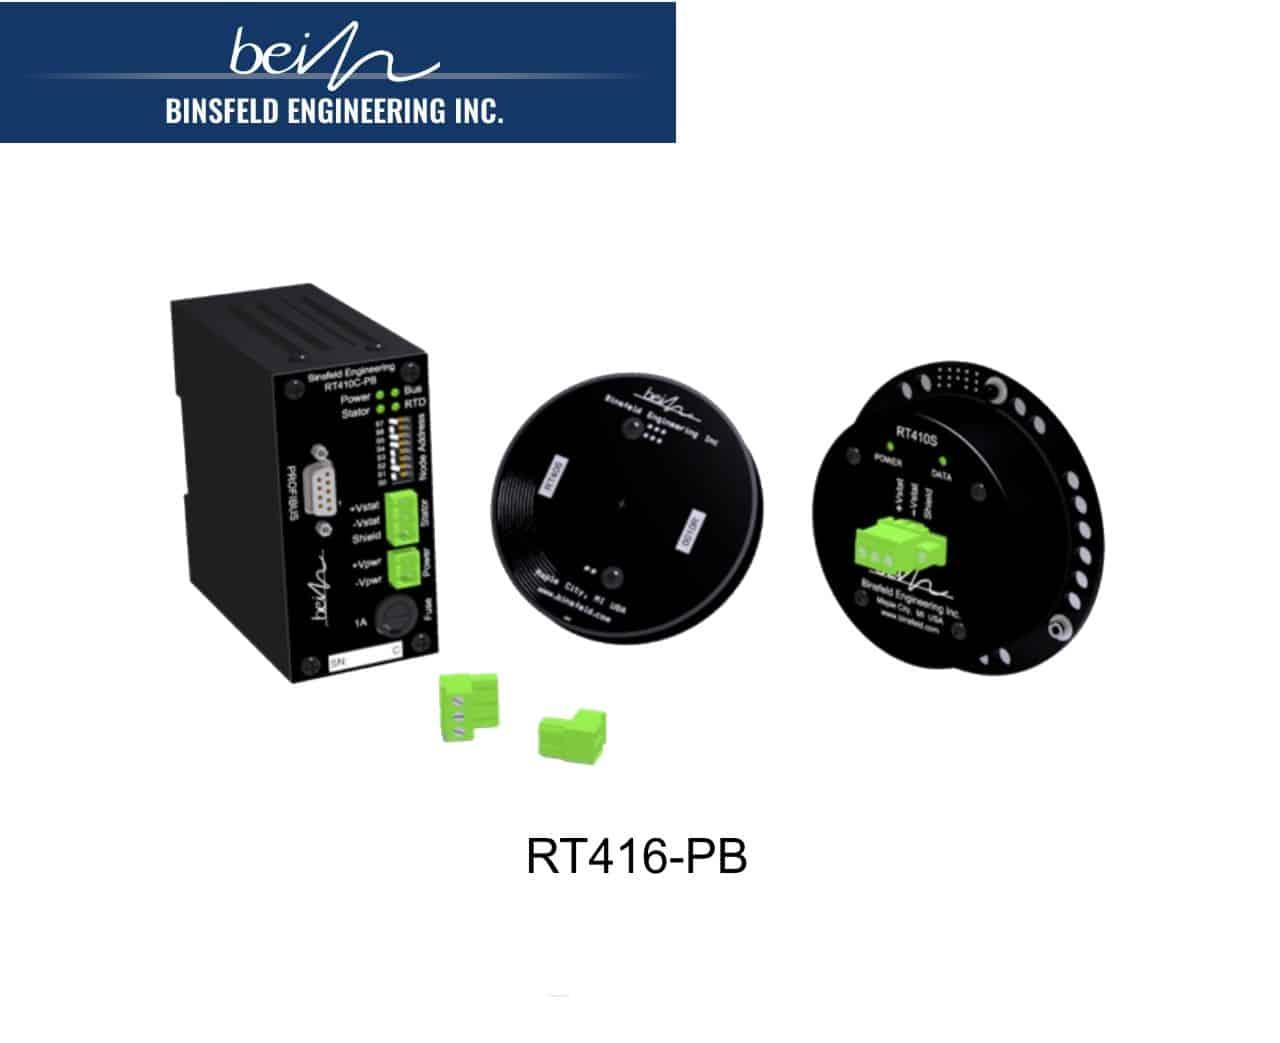 RT416-PB